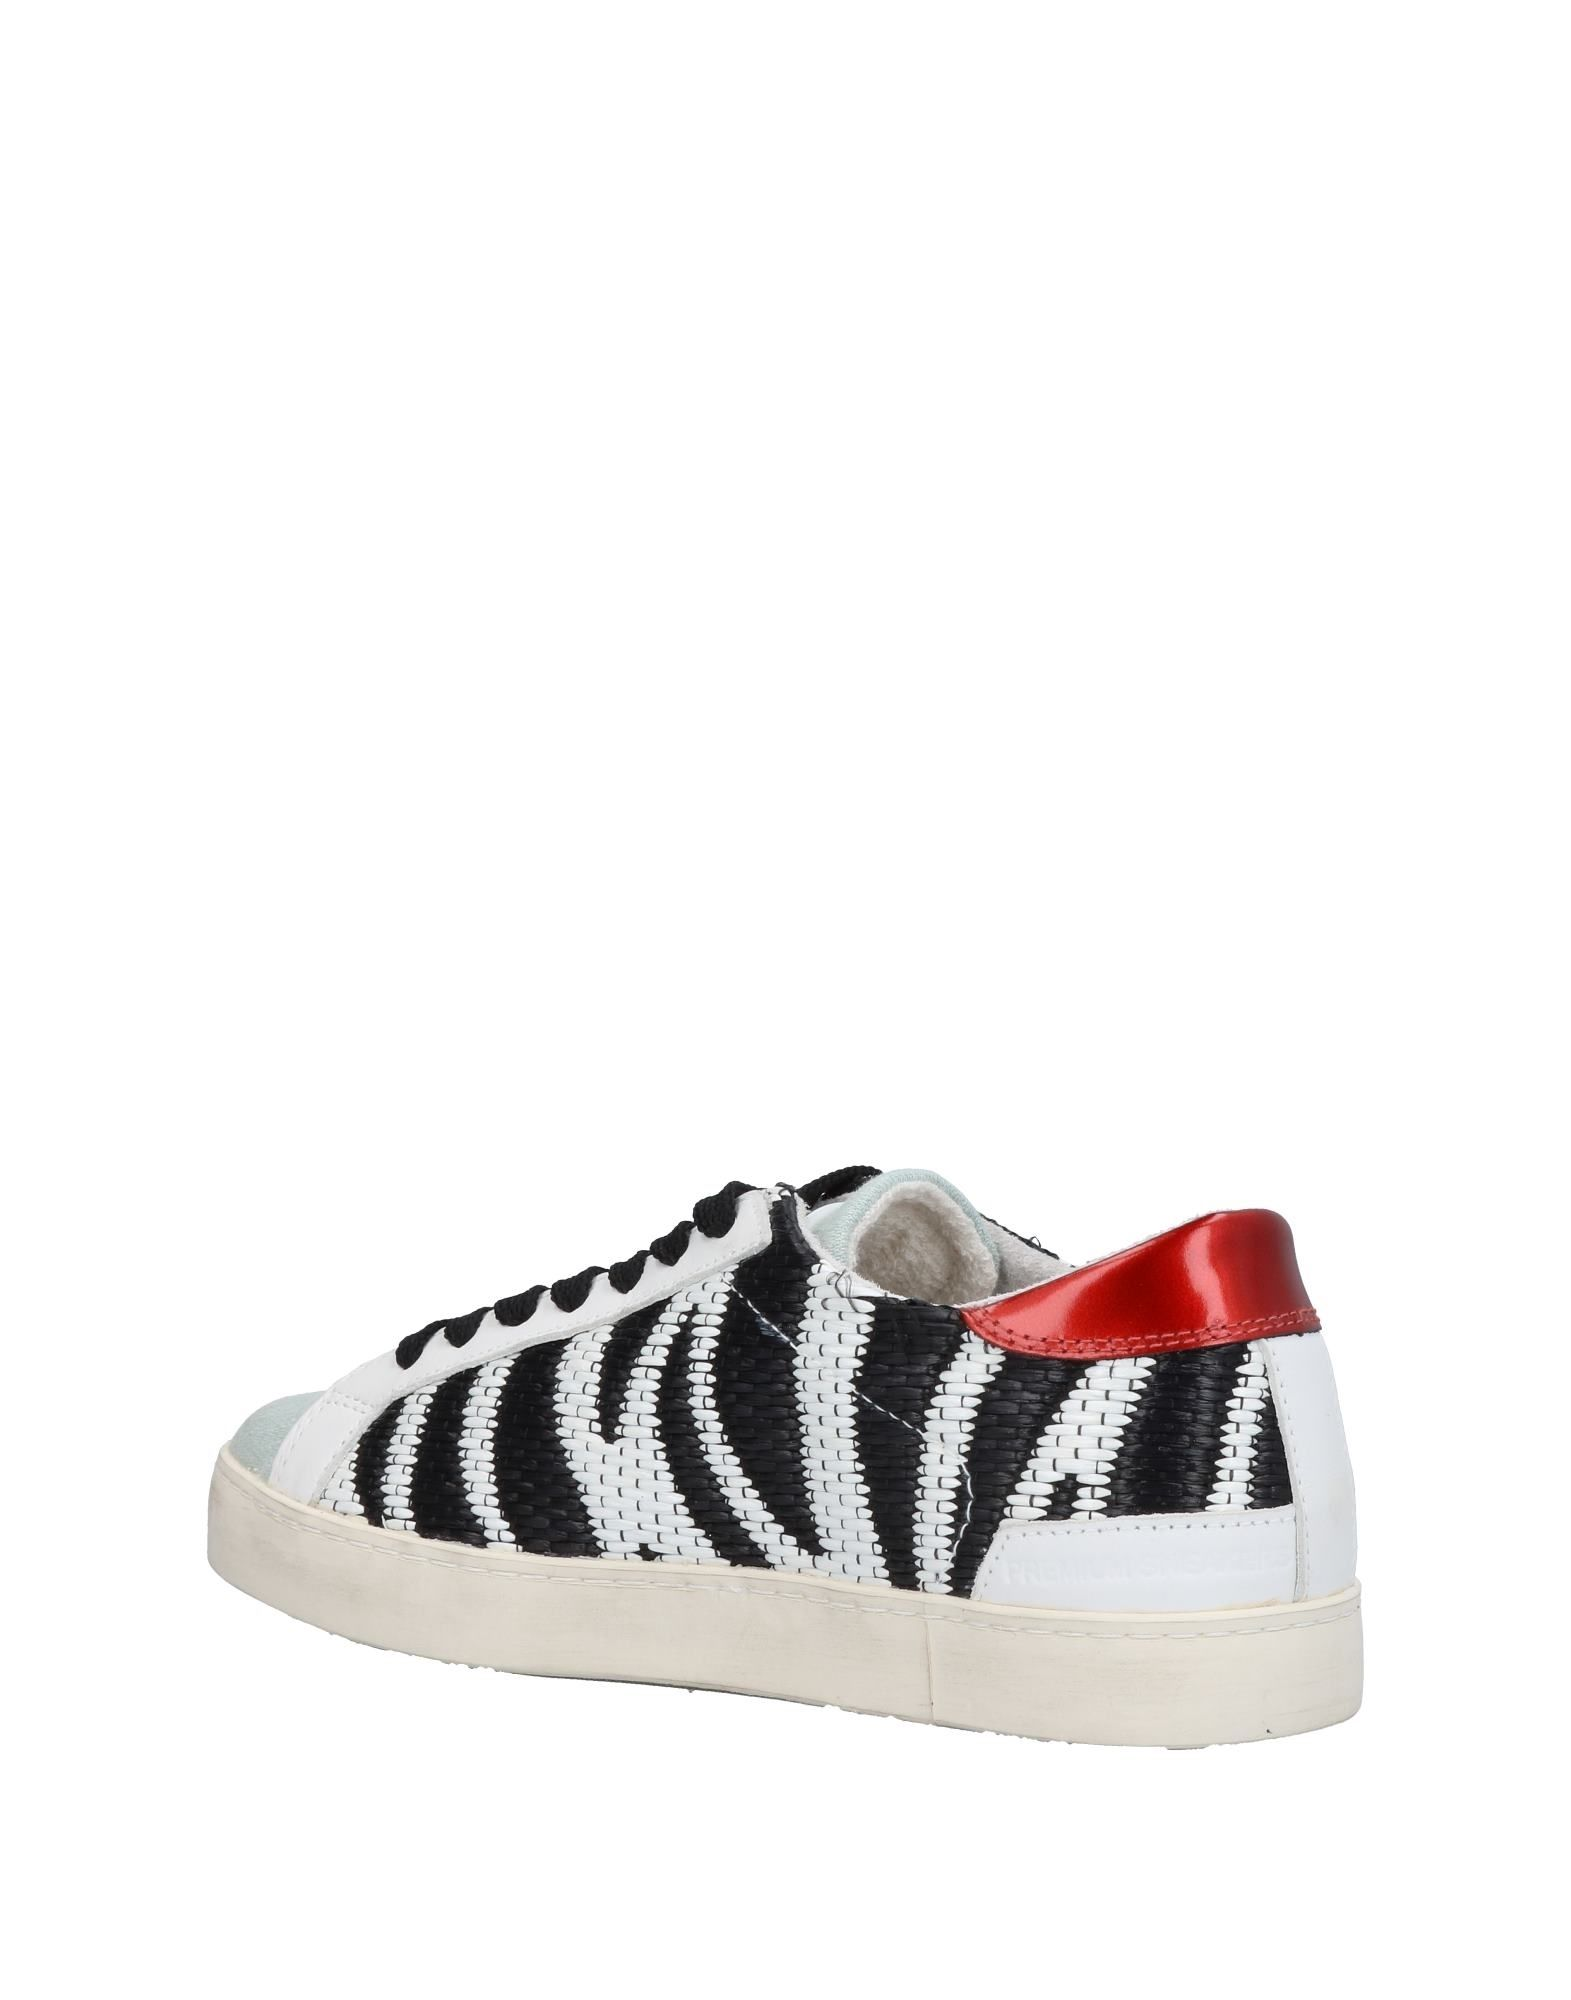 Sneakers D.A.T.E. D.A.T.E. Sneakers Donna - 11414964OH elegante 1ff737